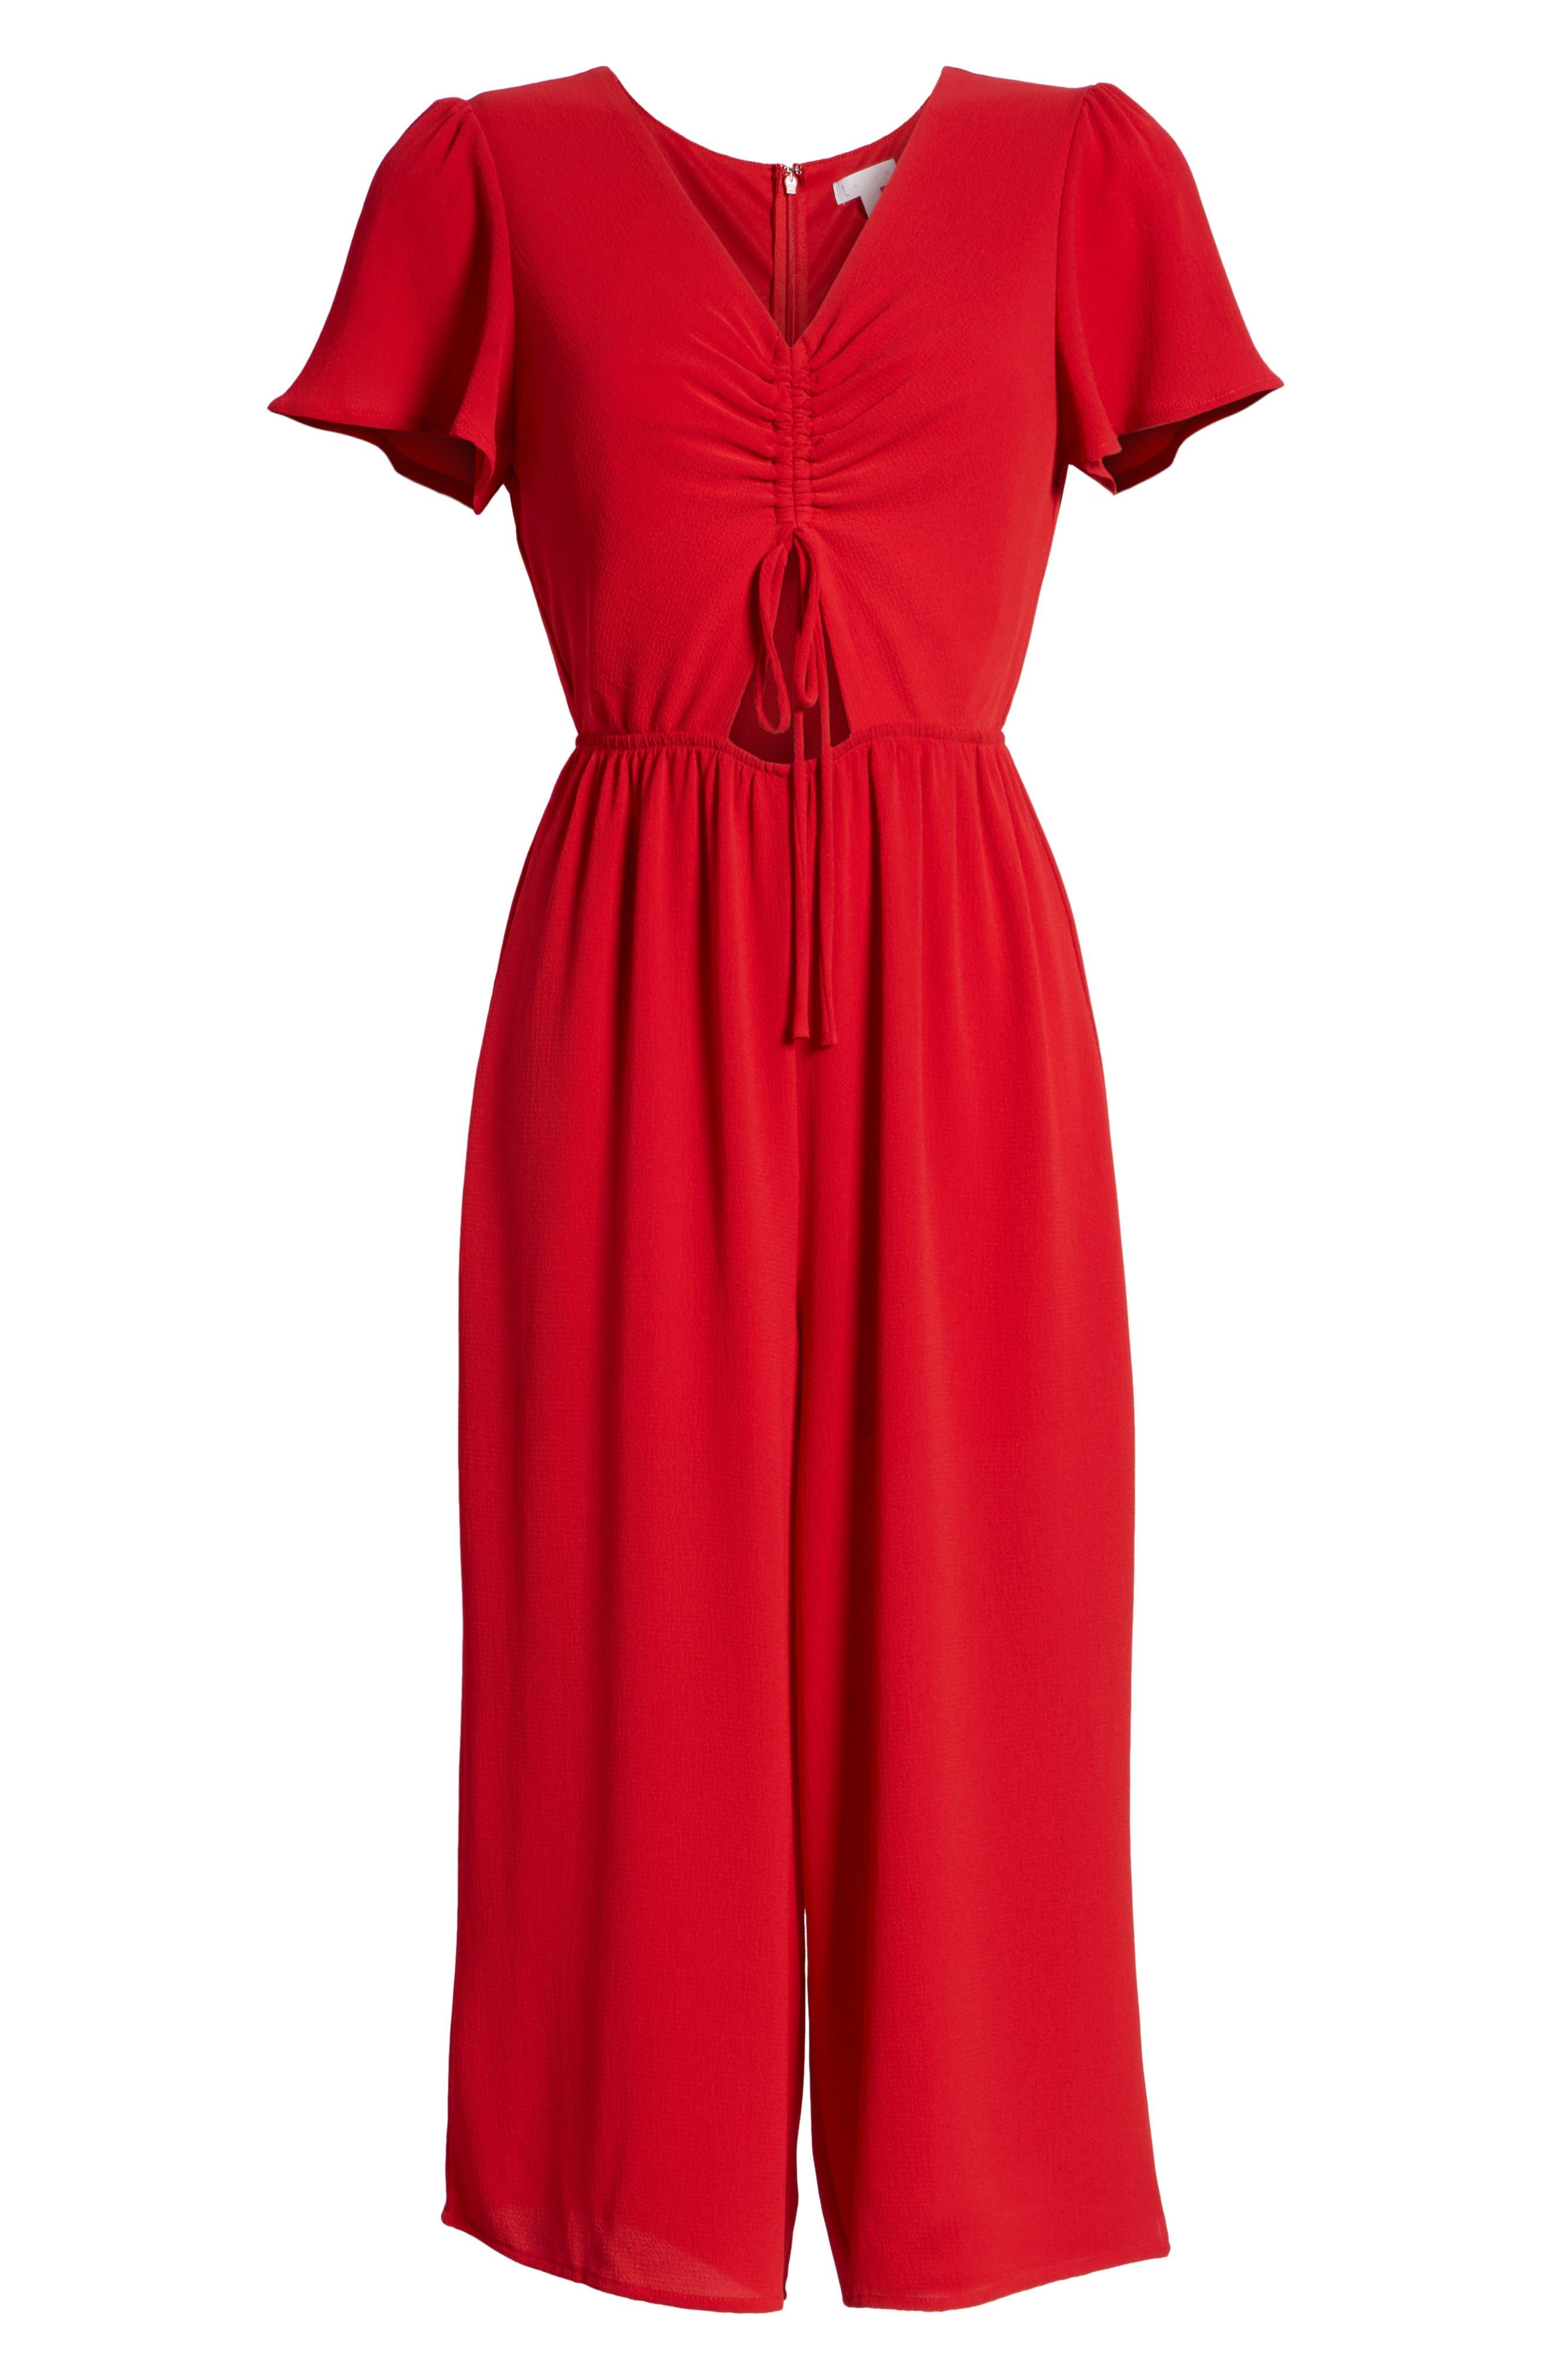 Cinch Front Crop Jumpsuit,                             Alternate thumbnail 7, color,                             RED LIPSTICK